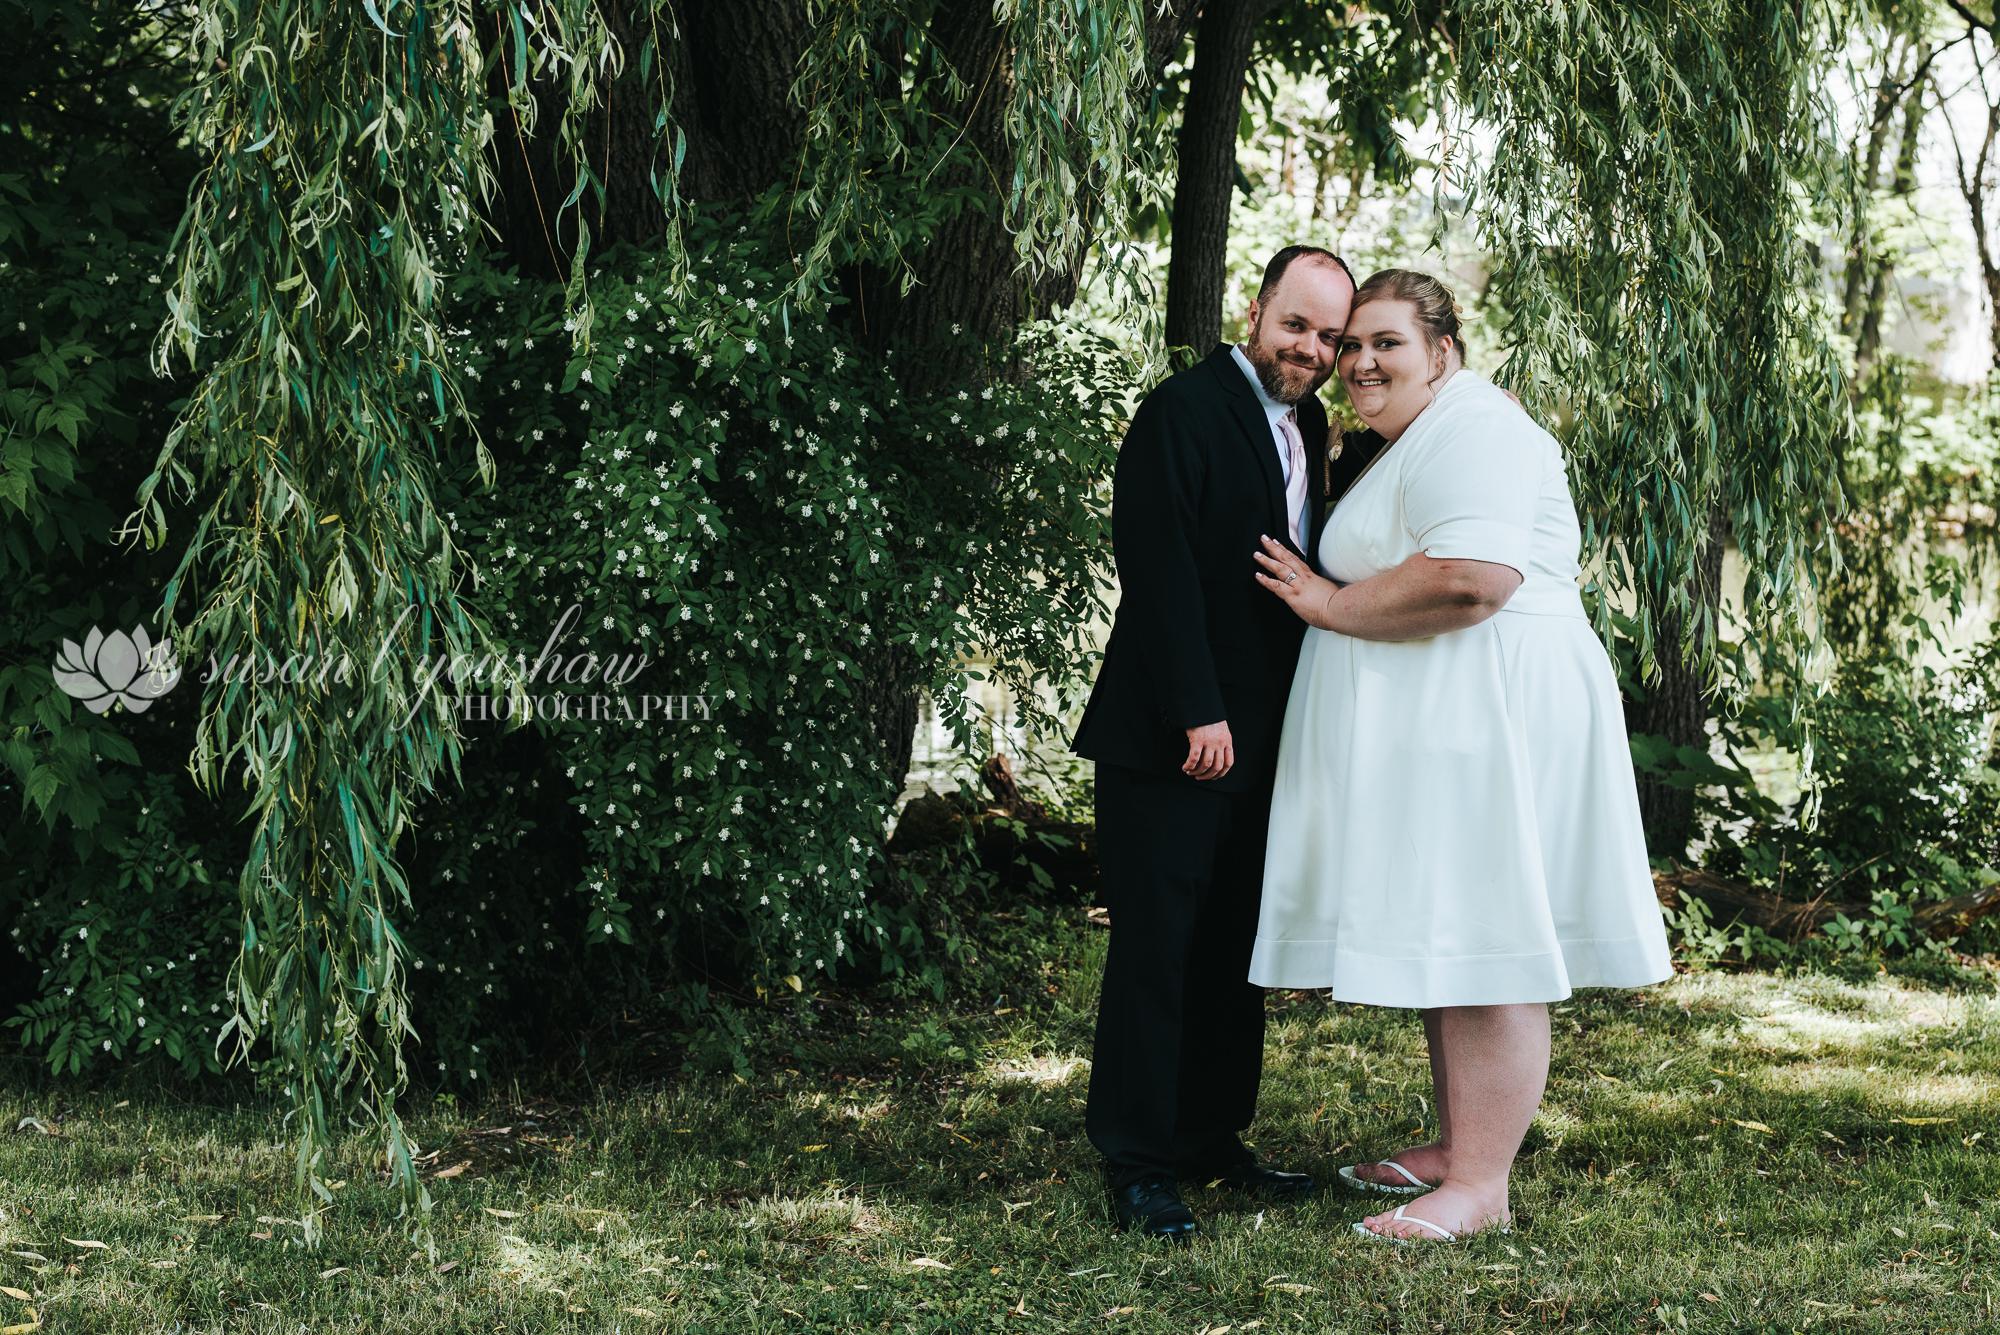 Bill and Sarah Wedding Photos 06-08-2019 SLY Photography -65.jpg